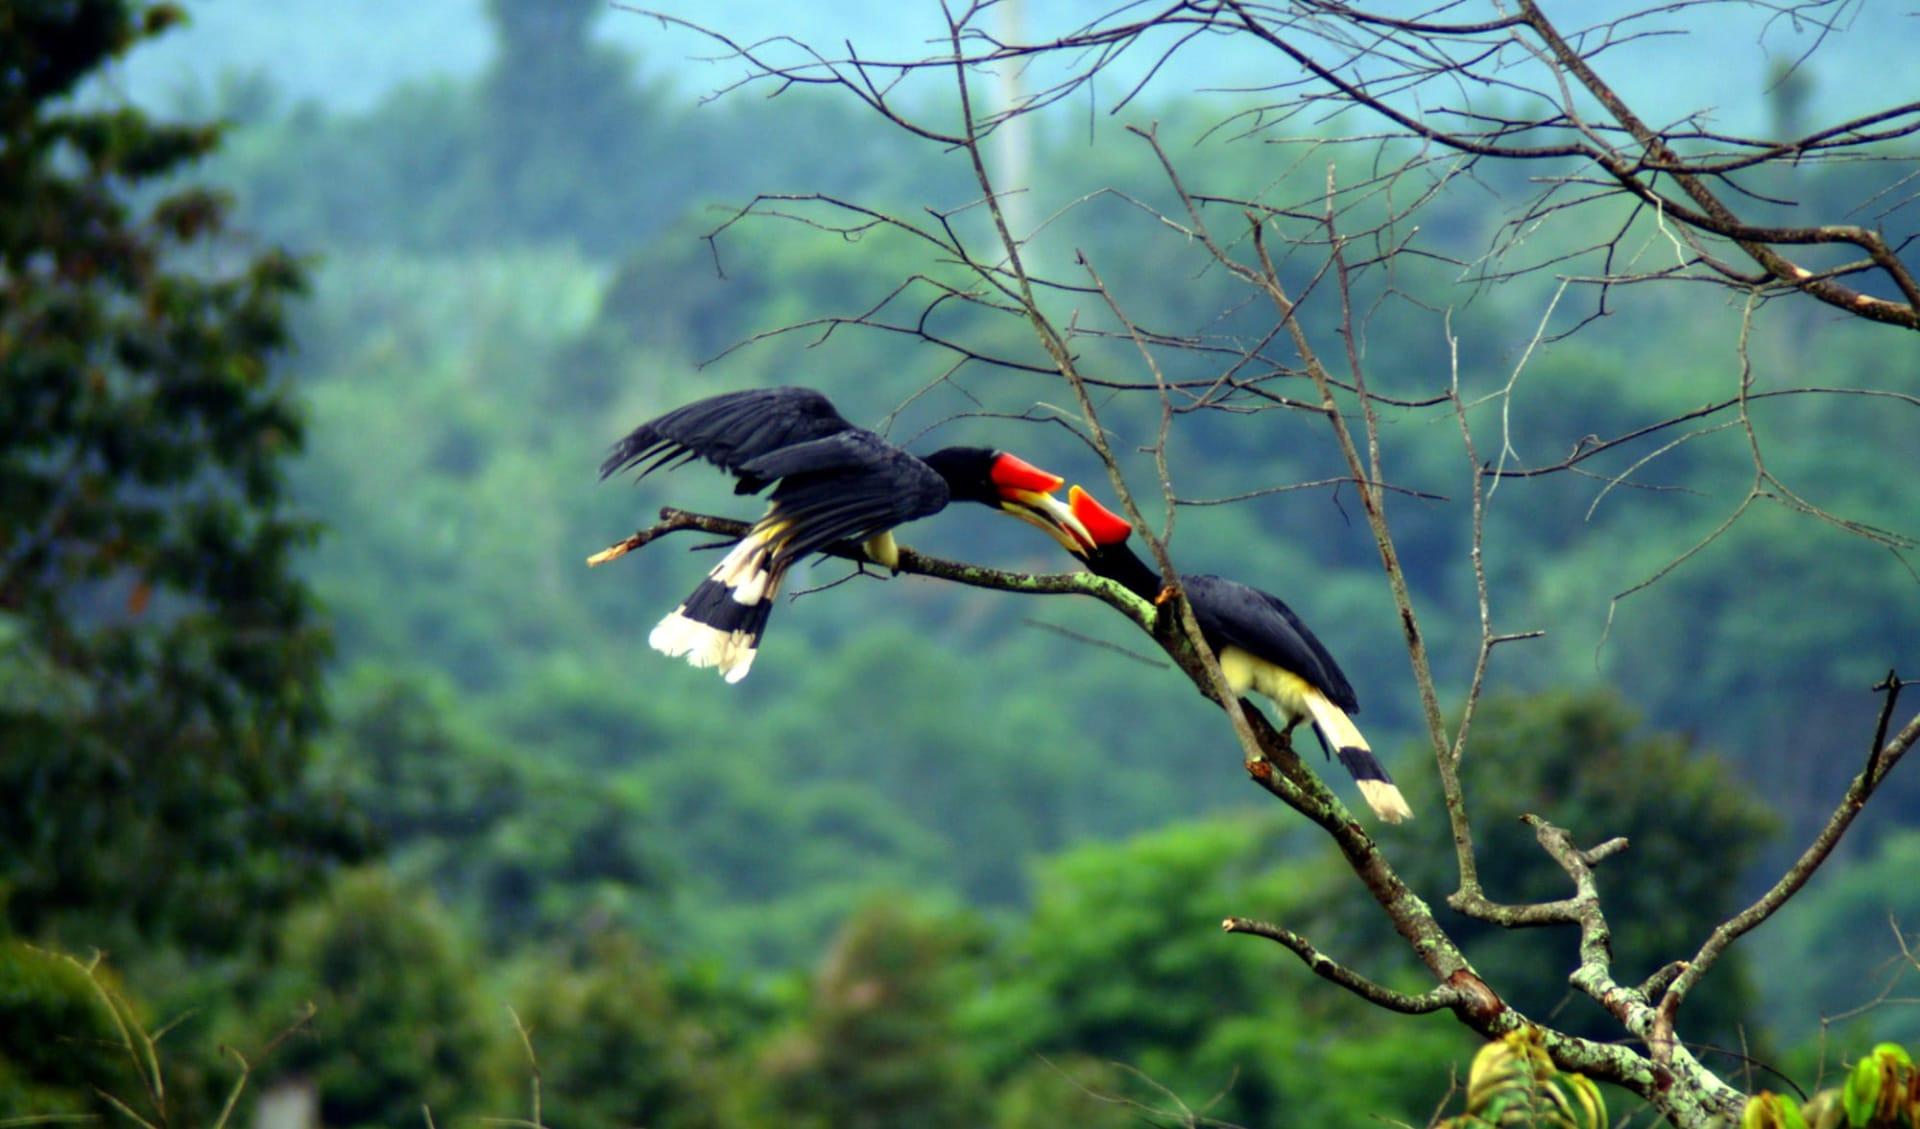 Borneo Wildlife / Borneo Rainforest Lodge ab Kota Kinabalu: Hornbill In Love